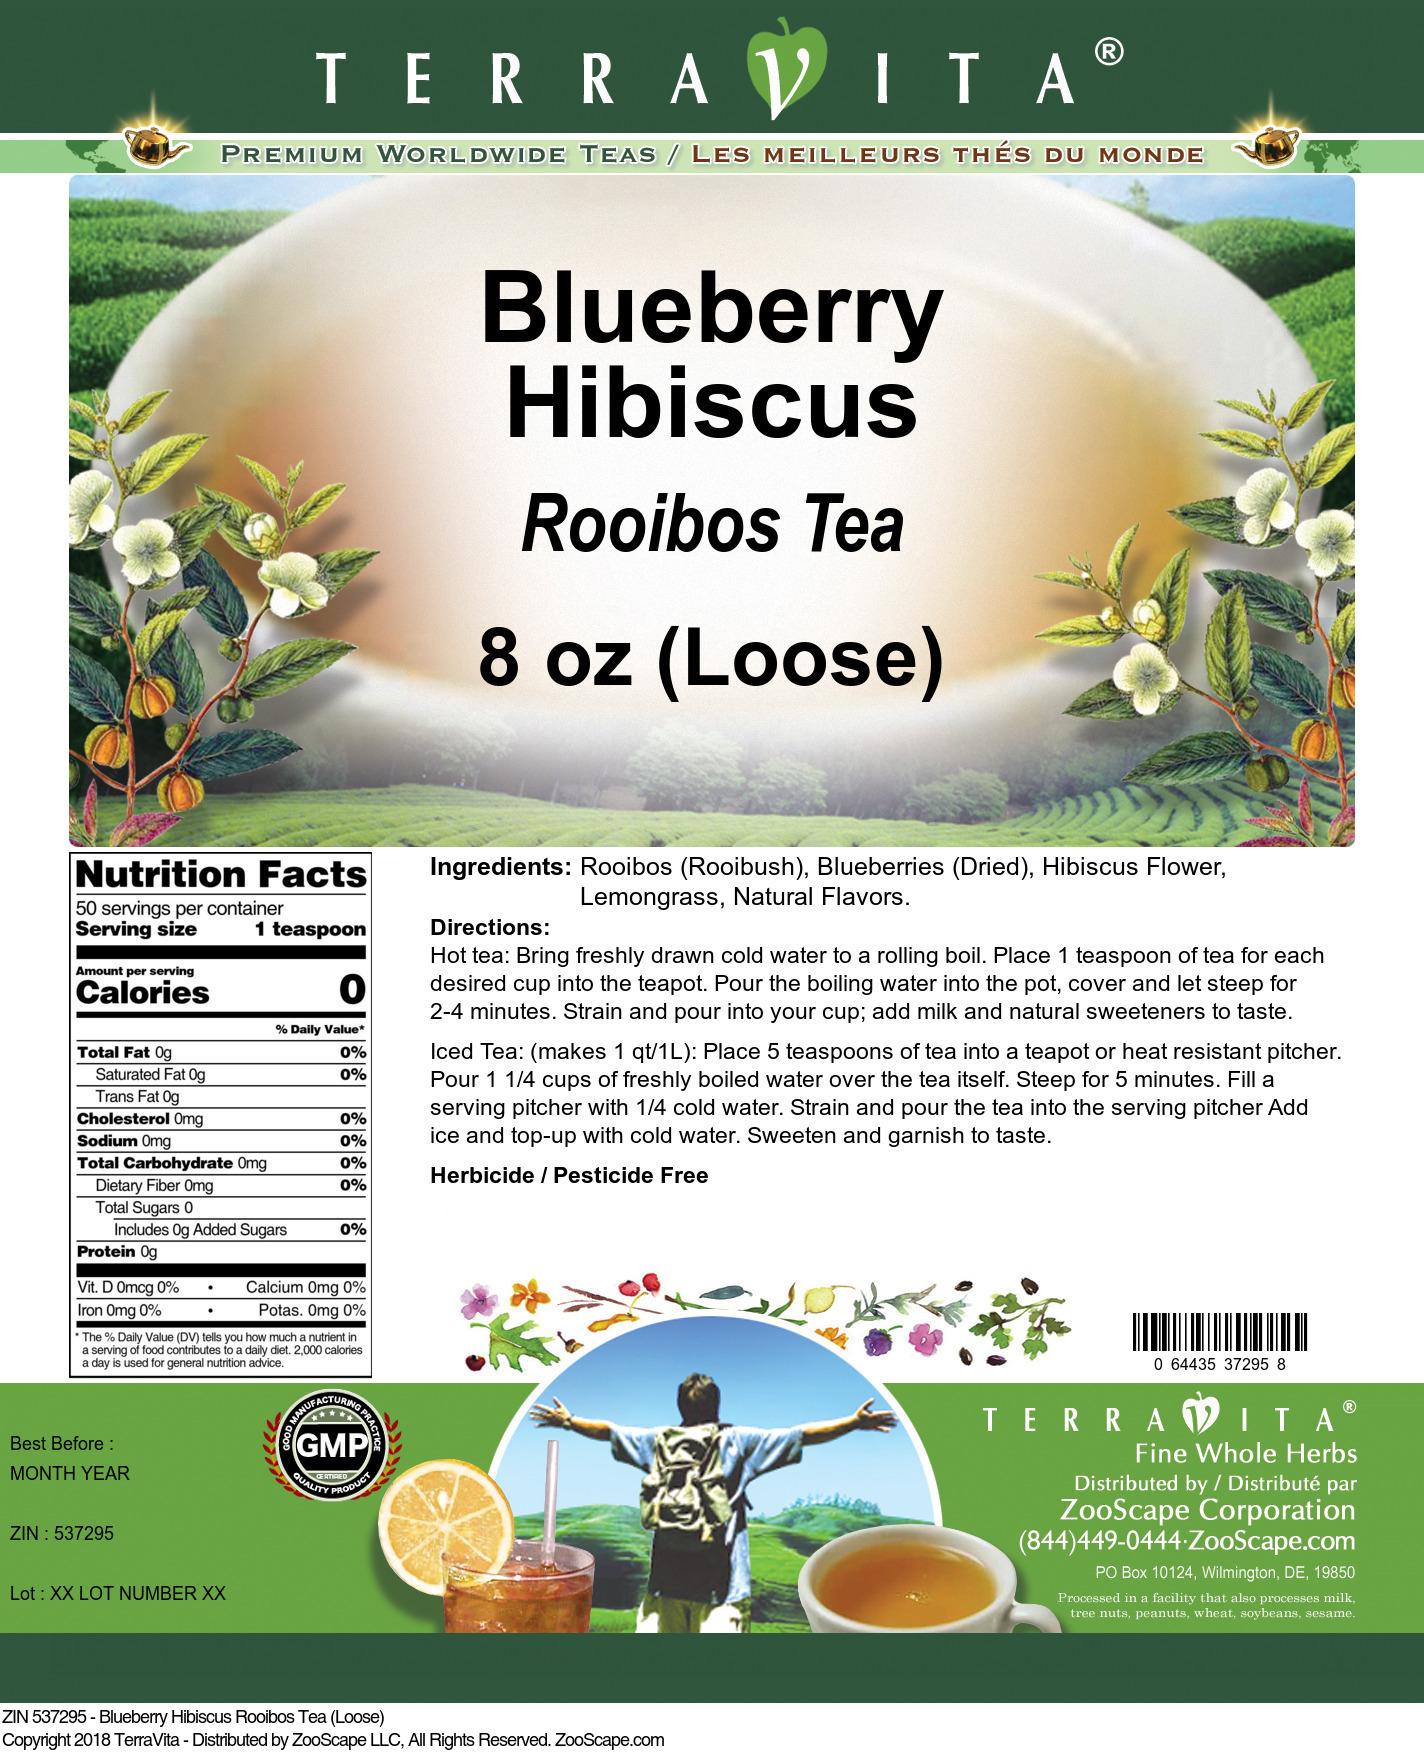 Blueberry Hibiscus Rooibos Tea (Loose)